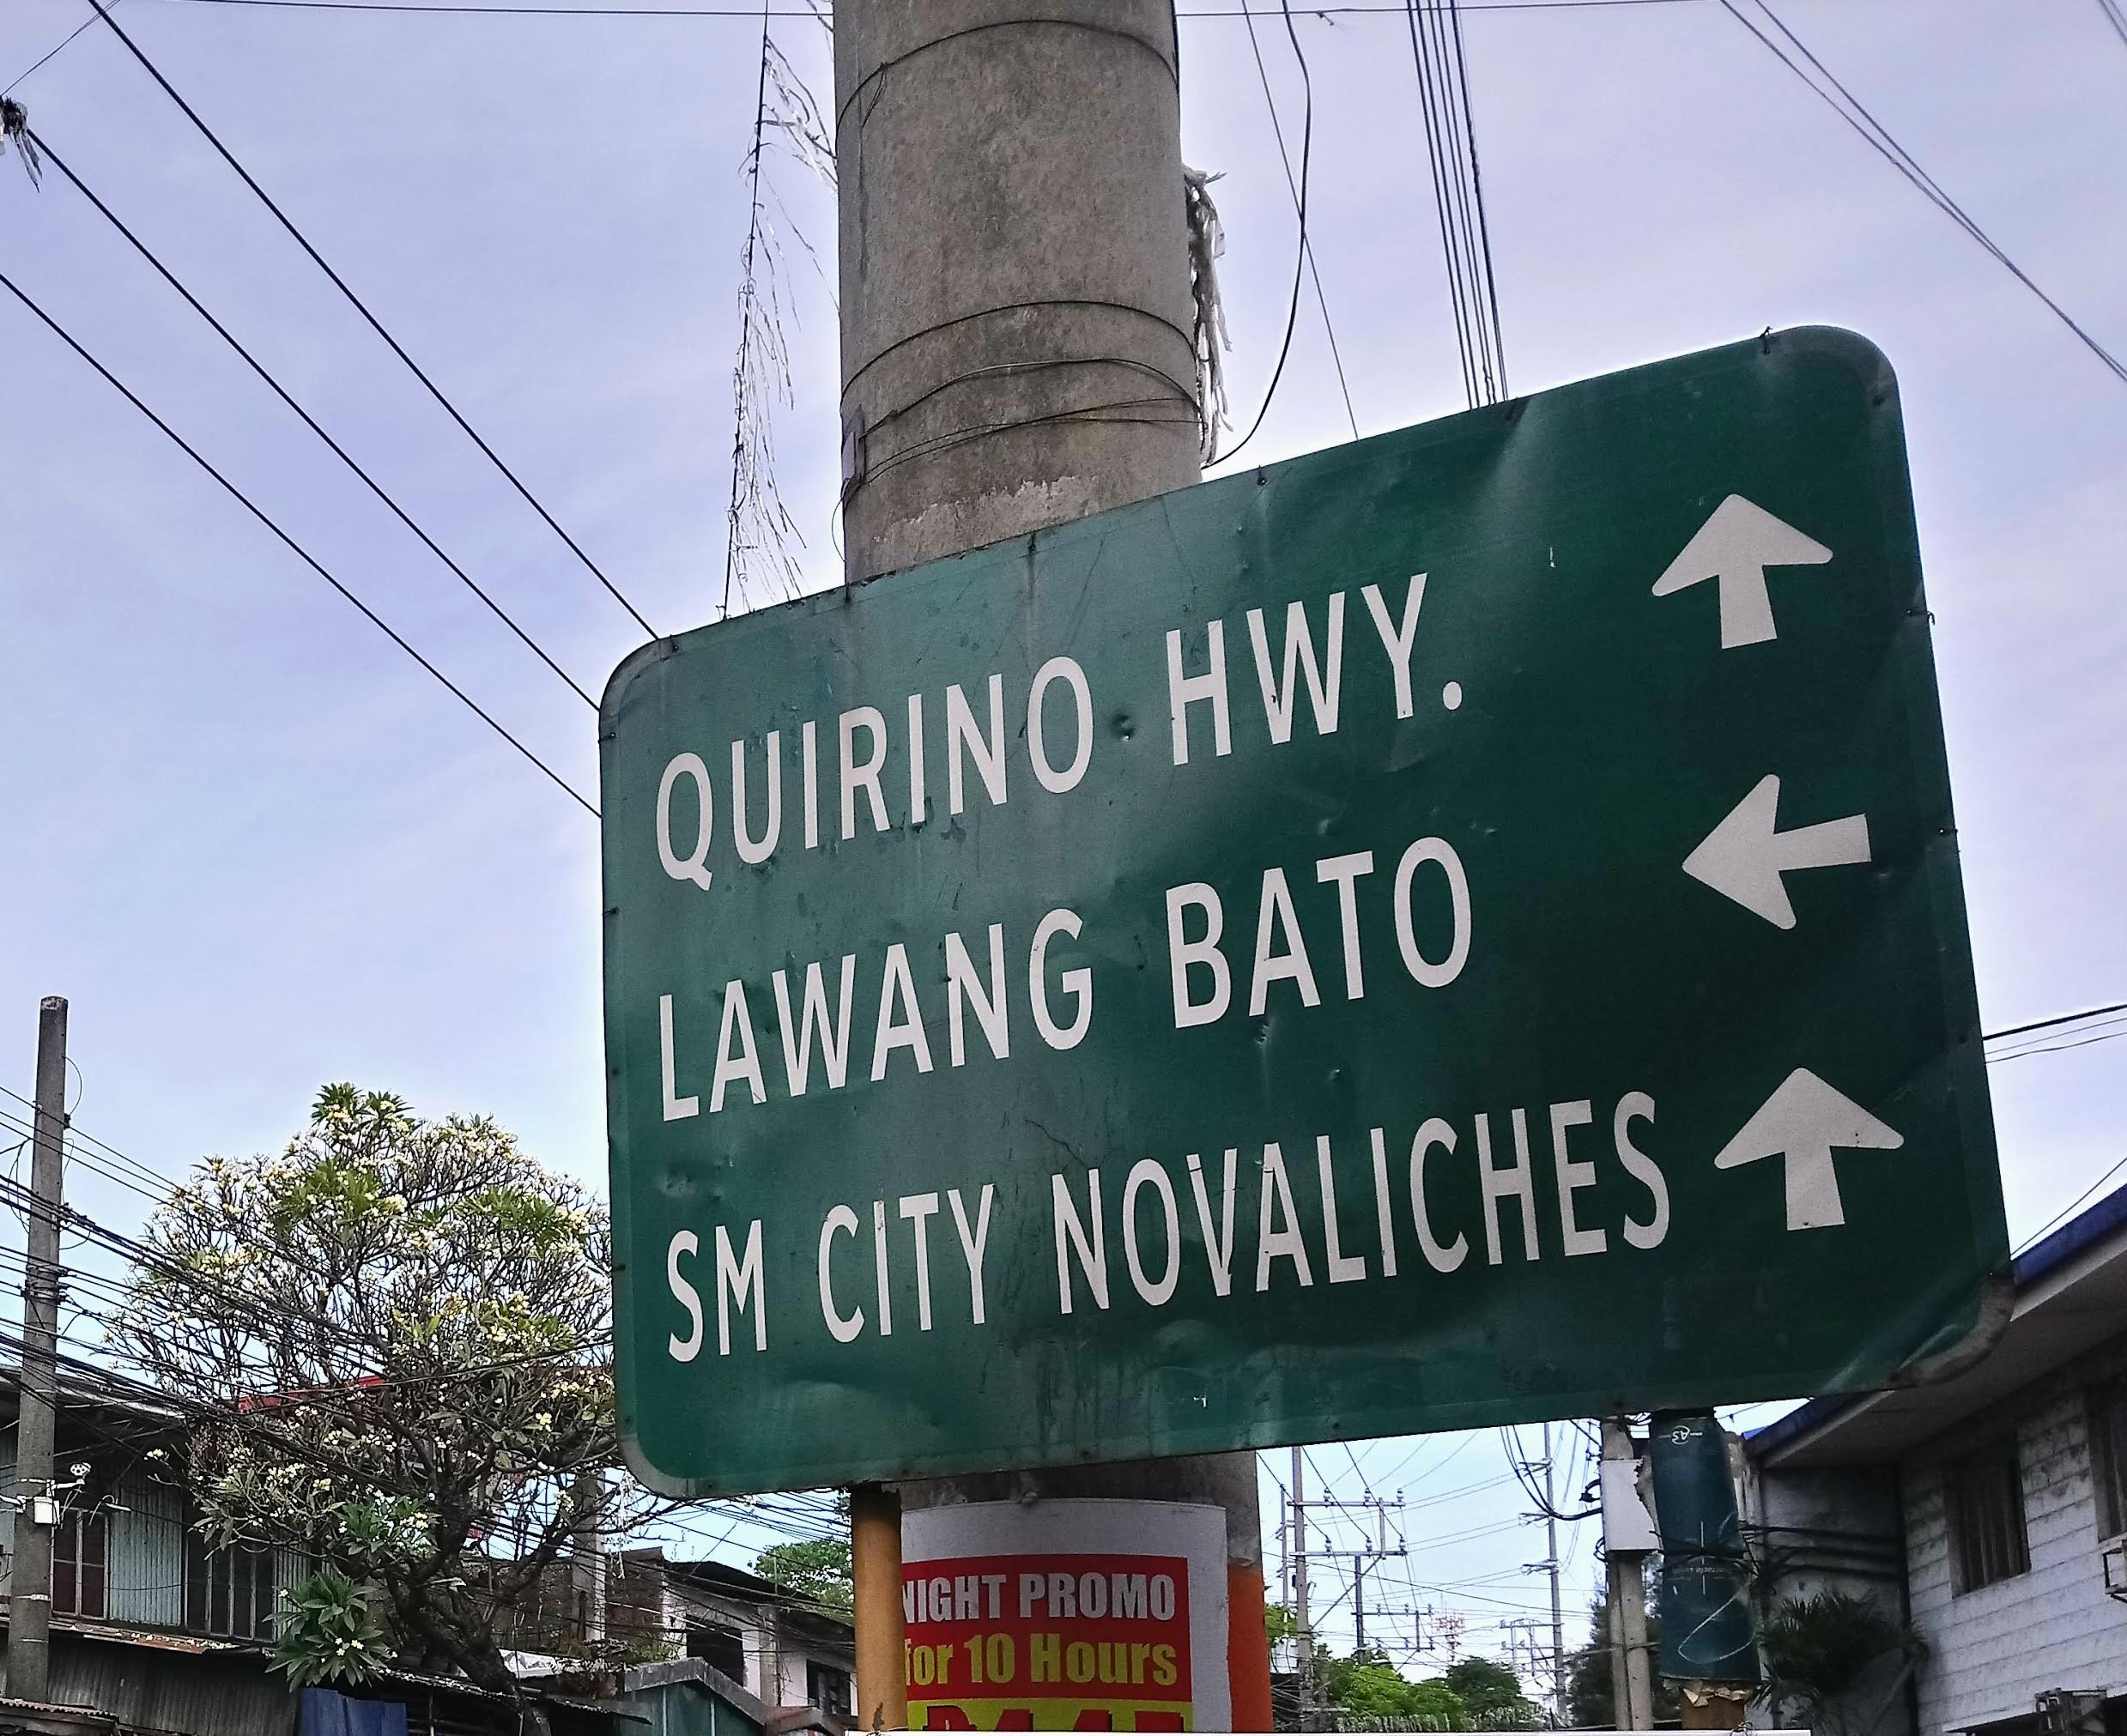 quirini-highway-and-lawang-bato-signage